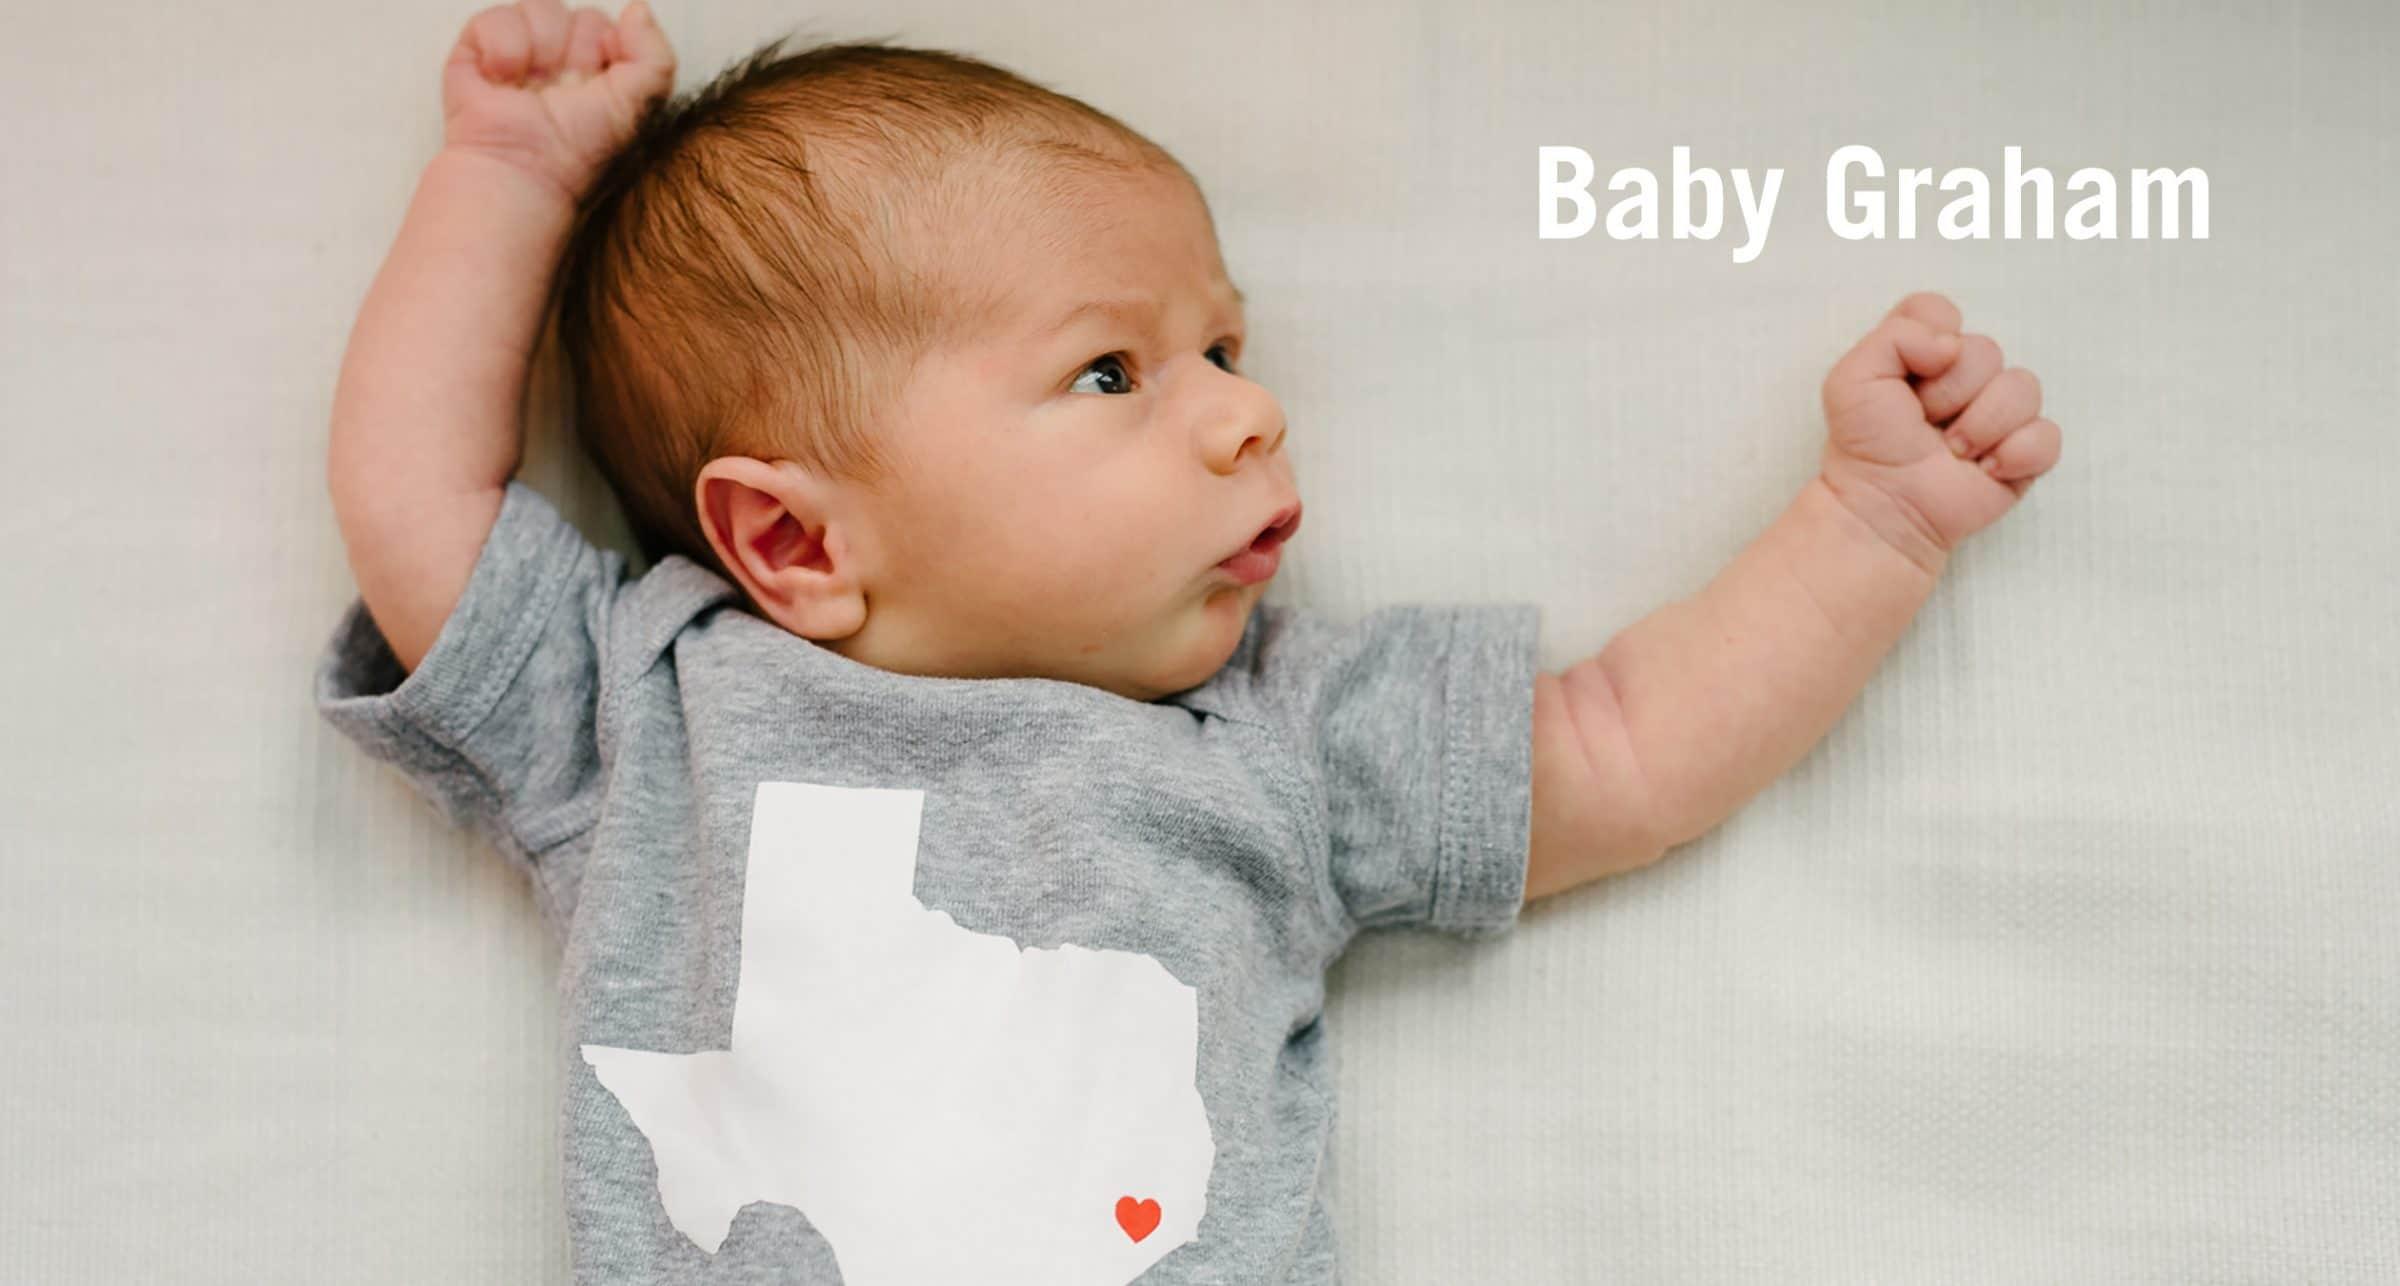 Houston newborn photographer Adam Nyholt